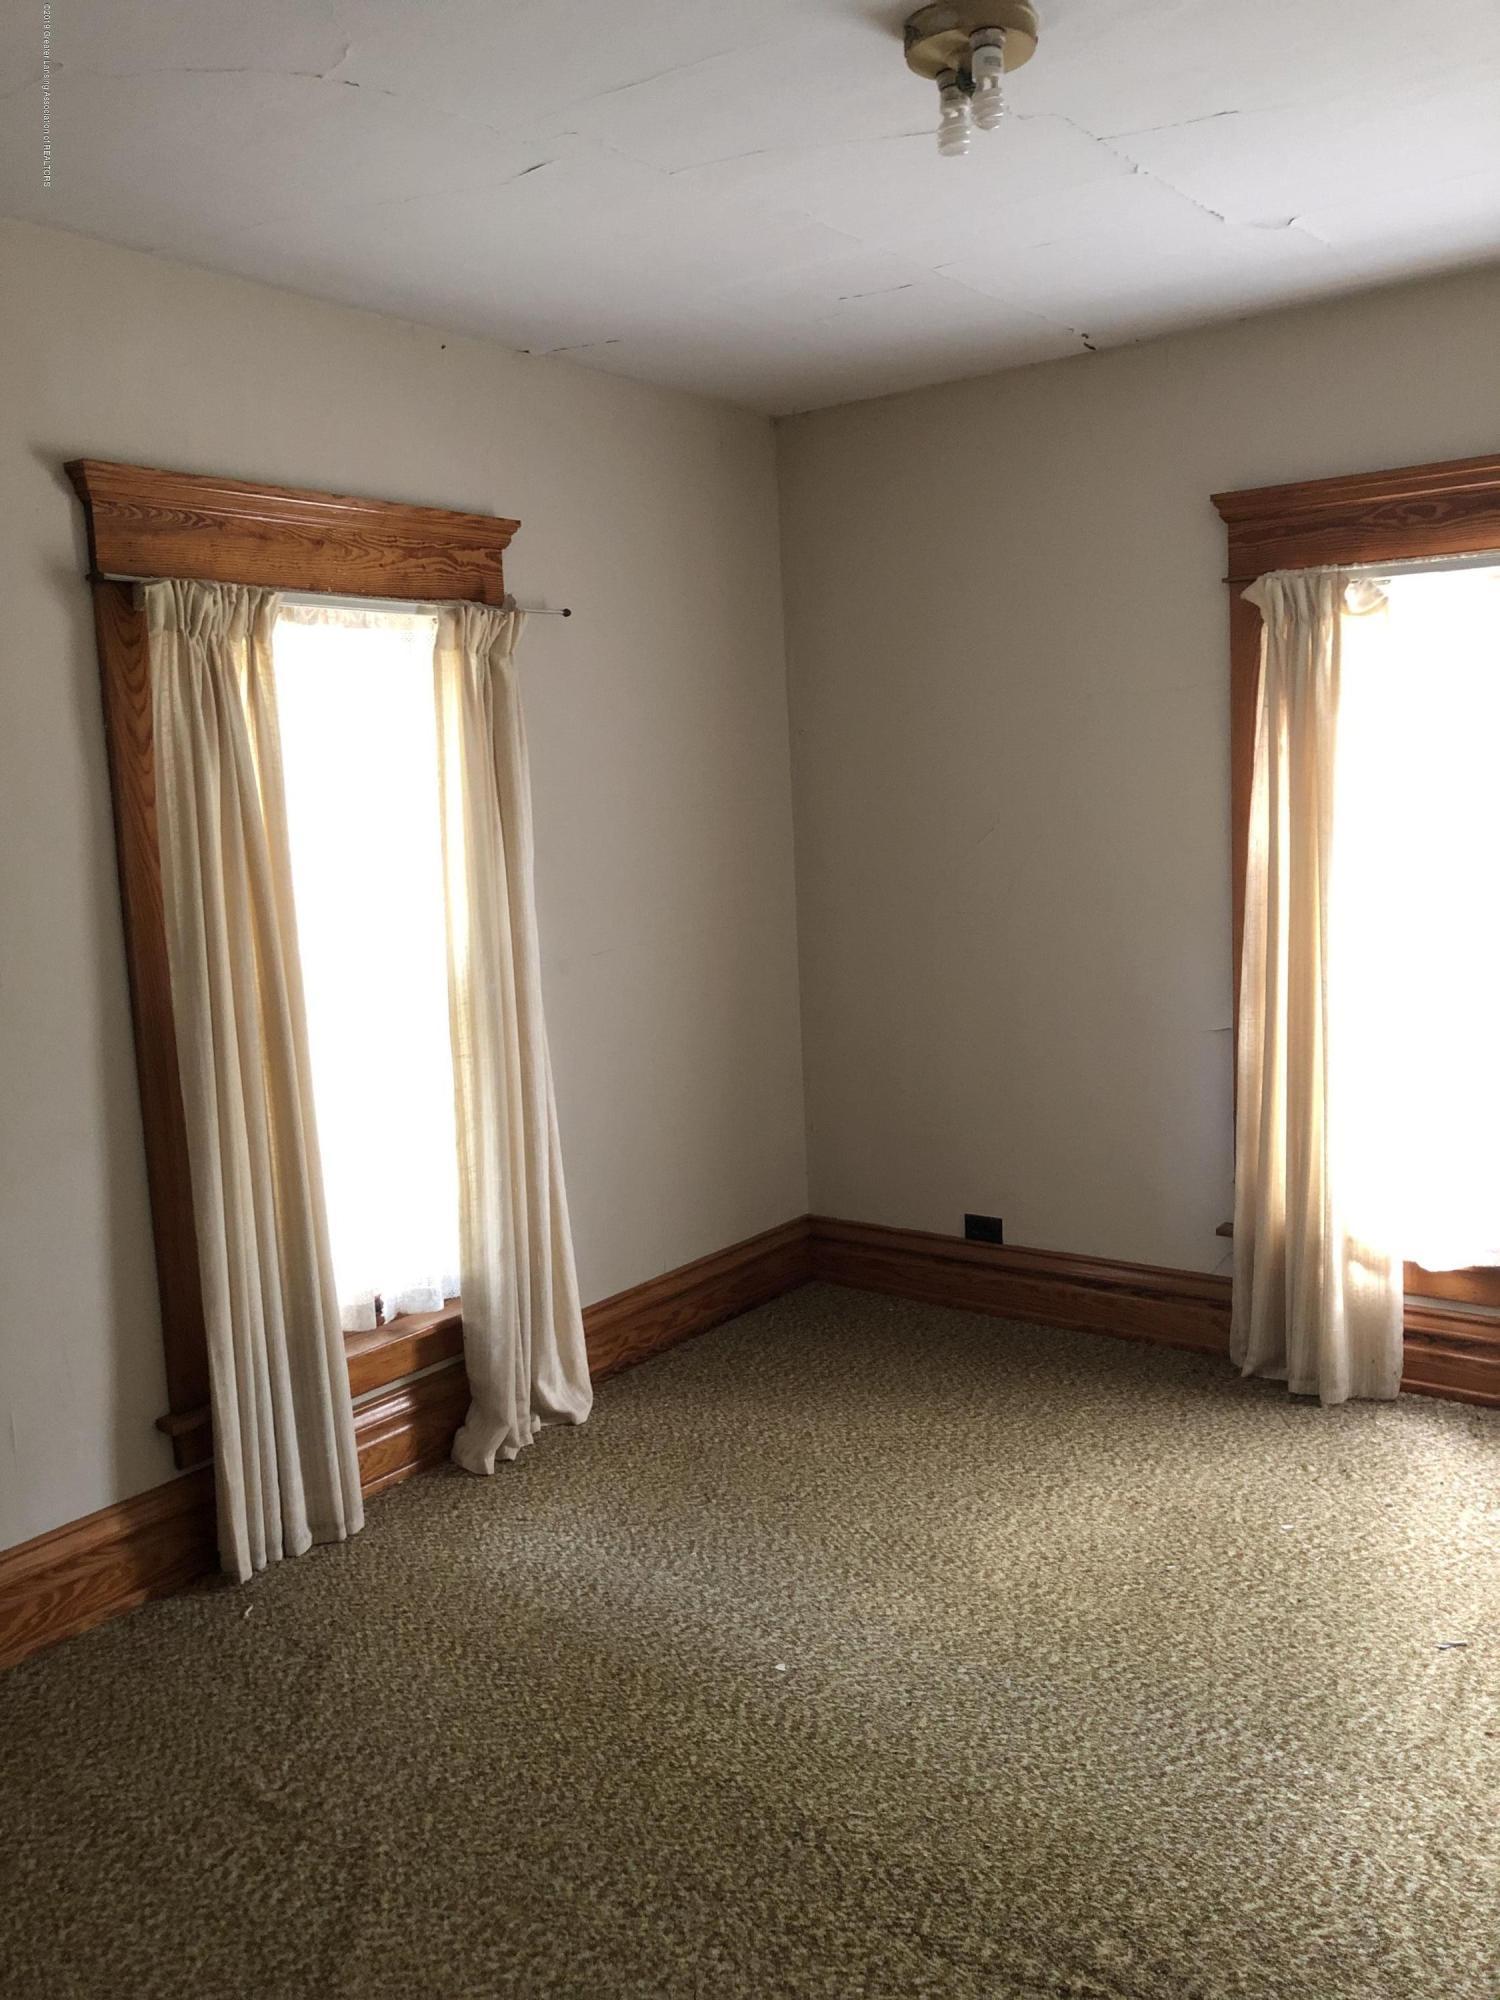 6748 W Beard Rd - 2nd floor bdroom - 24